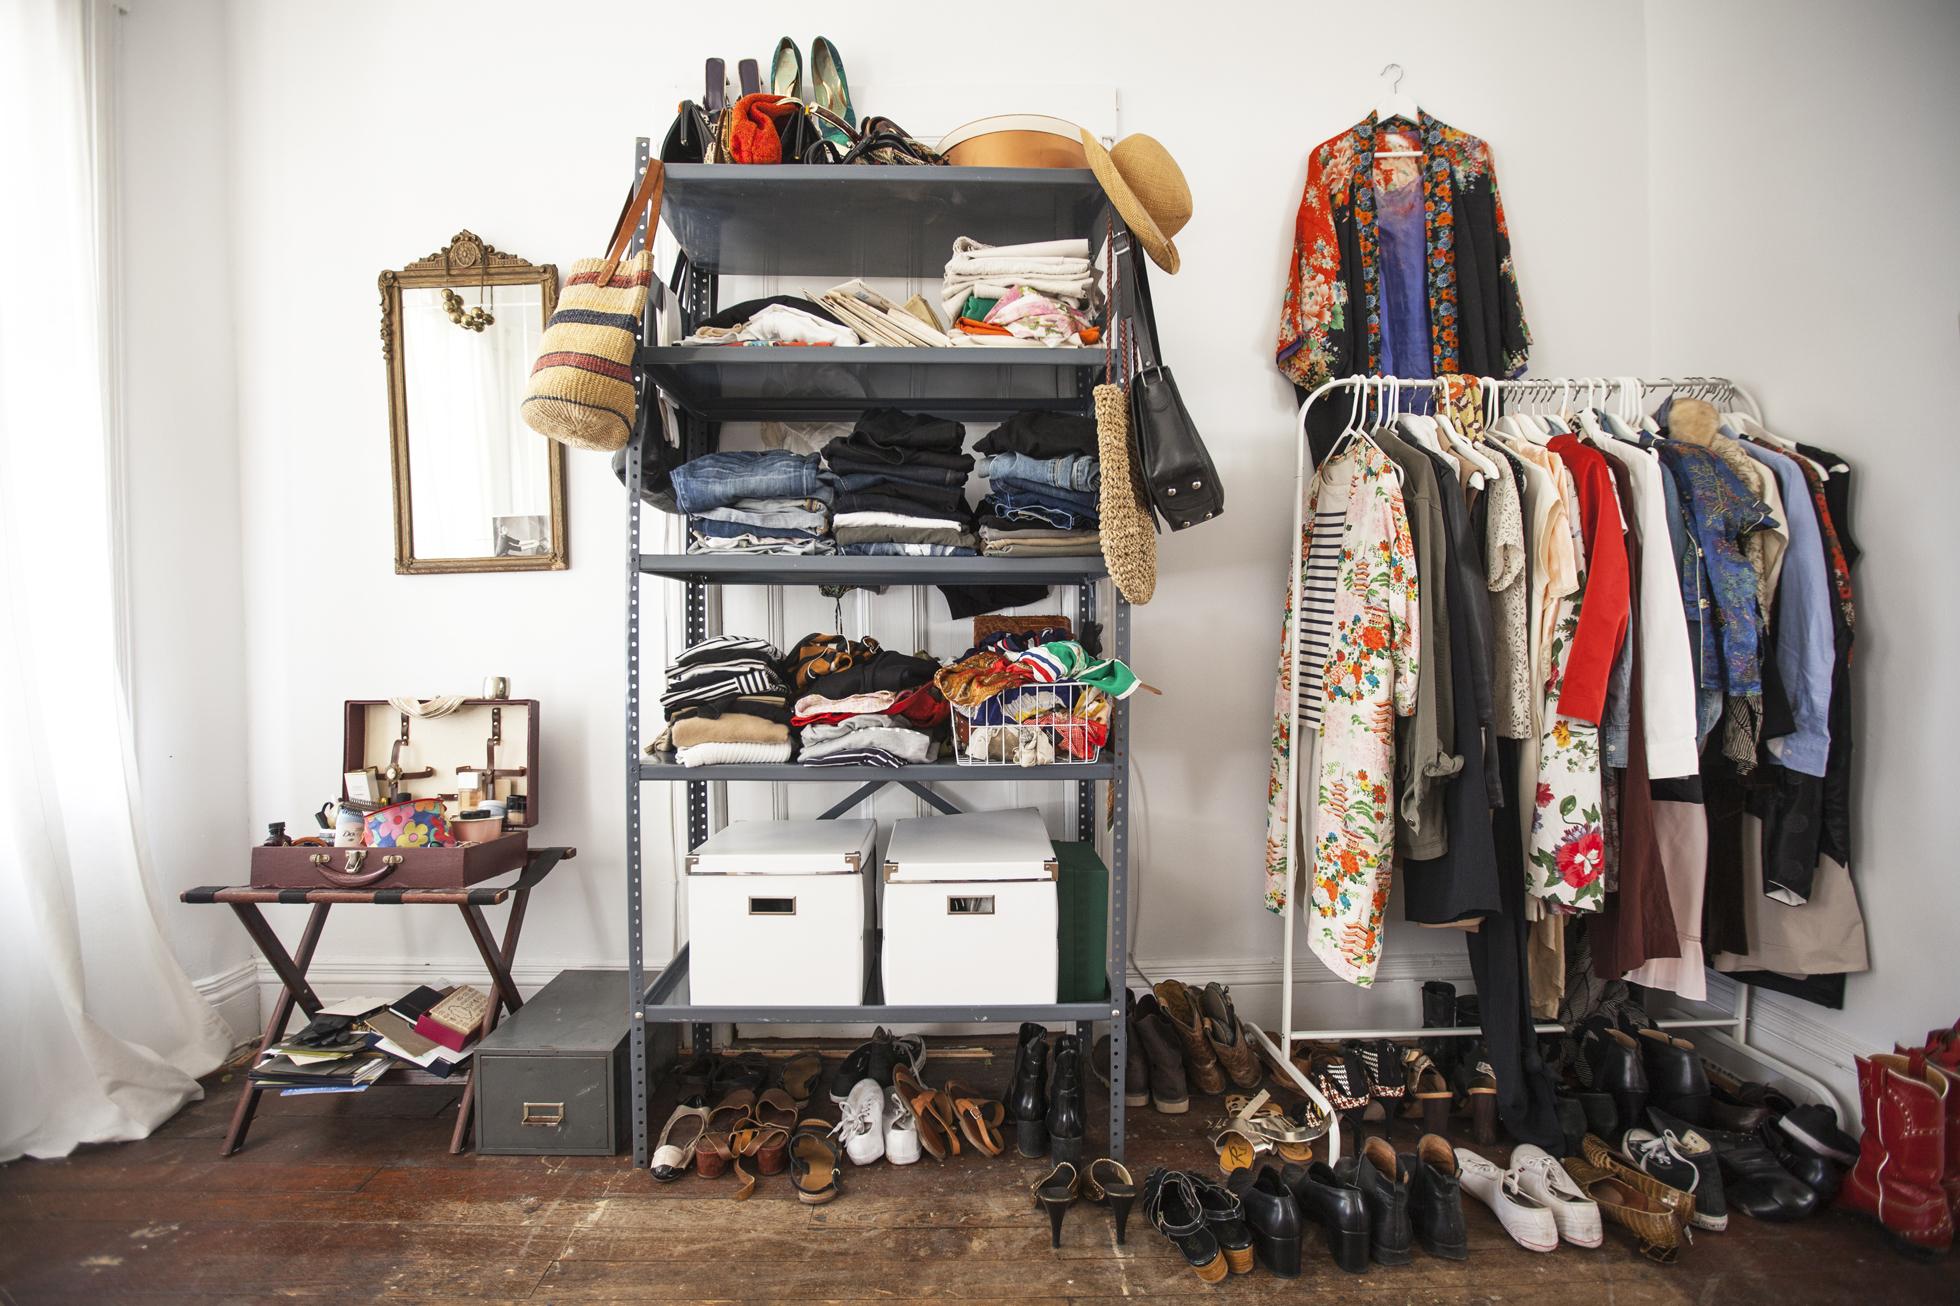 Overflow clothing storage